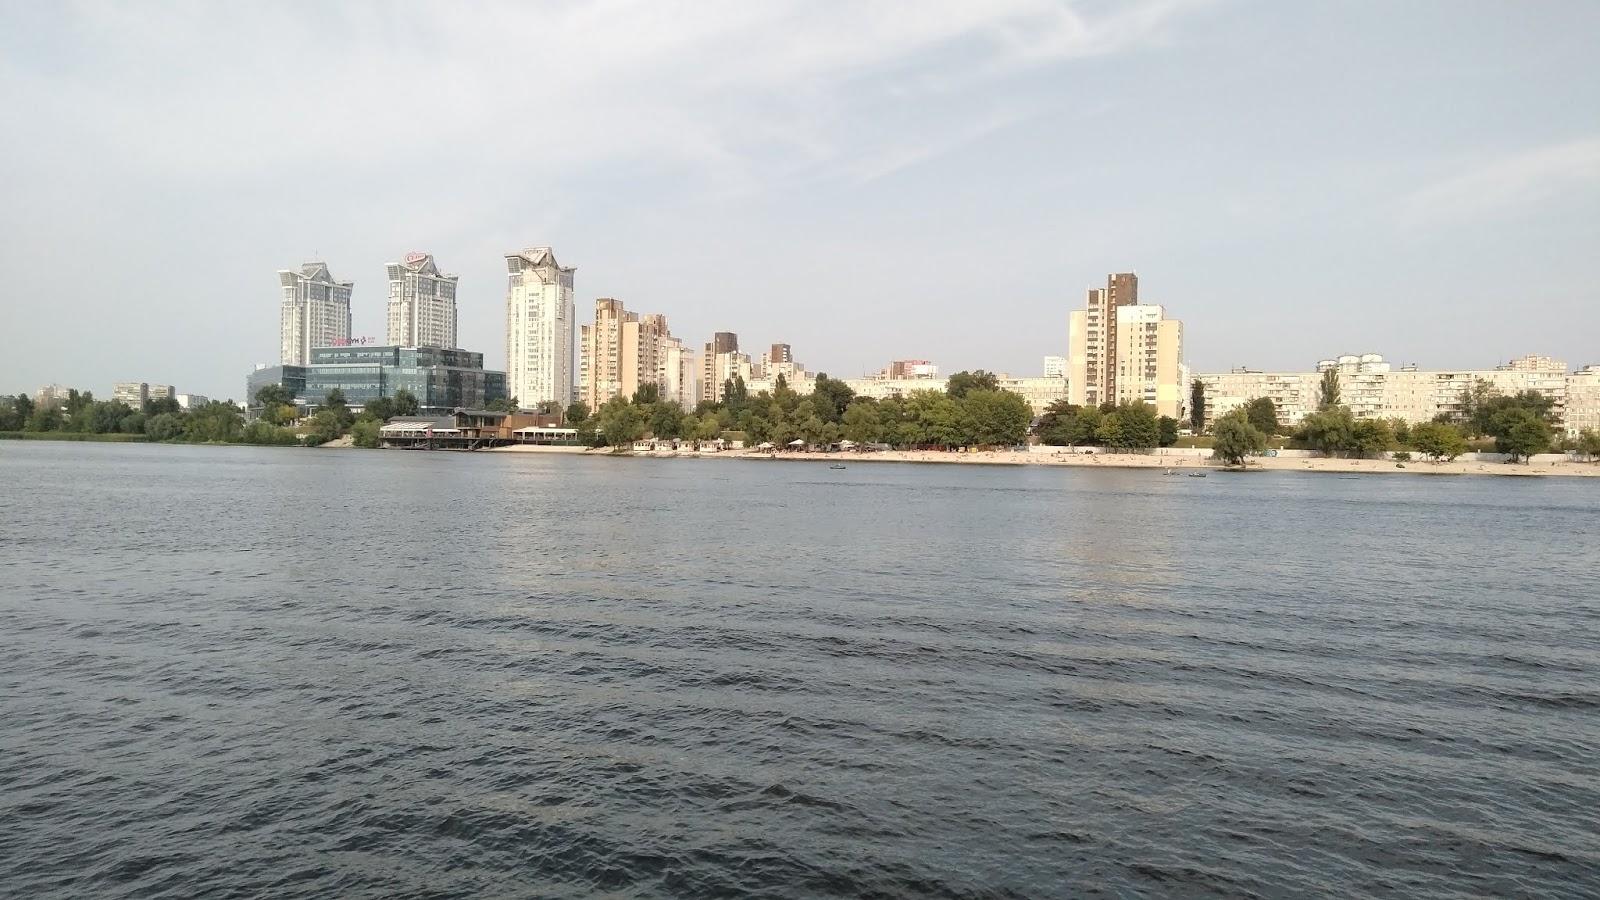 Me My Self And I Krezi Kamis 29 Jam Tangan Usb Mancis Keren Pemandangan Dari Sungai